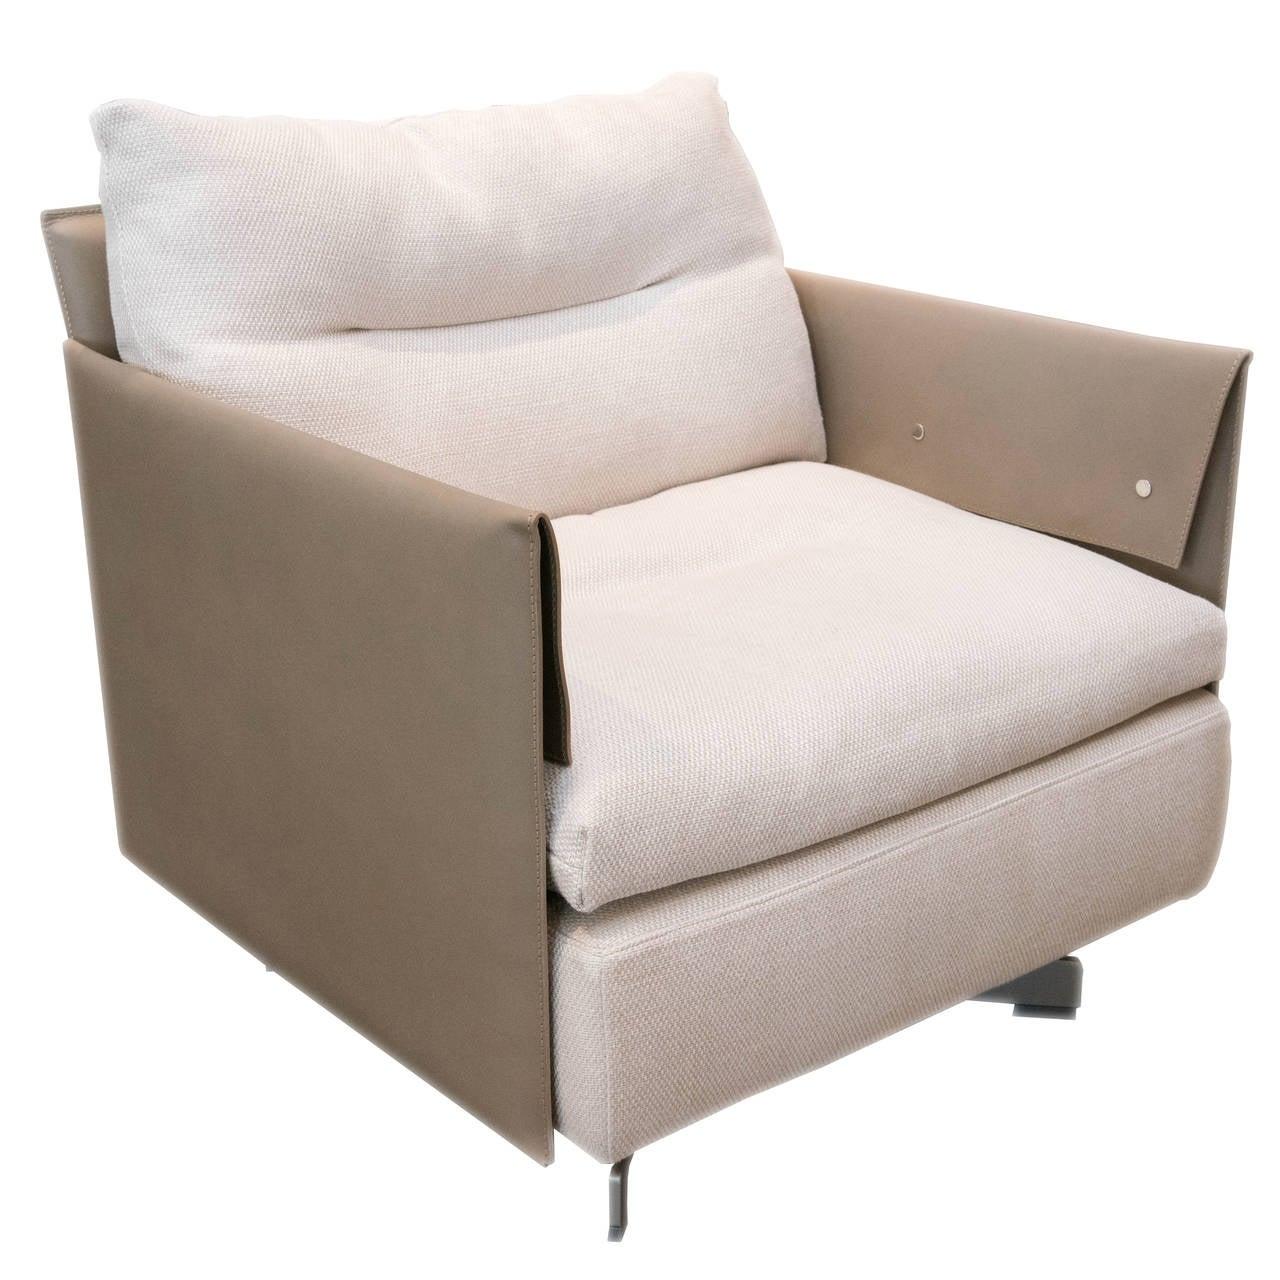 Poltrona frau grantorino swivel armchair for sale at 1stdibs for Poltrona torino